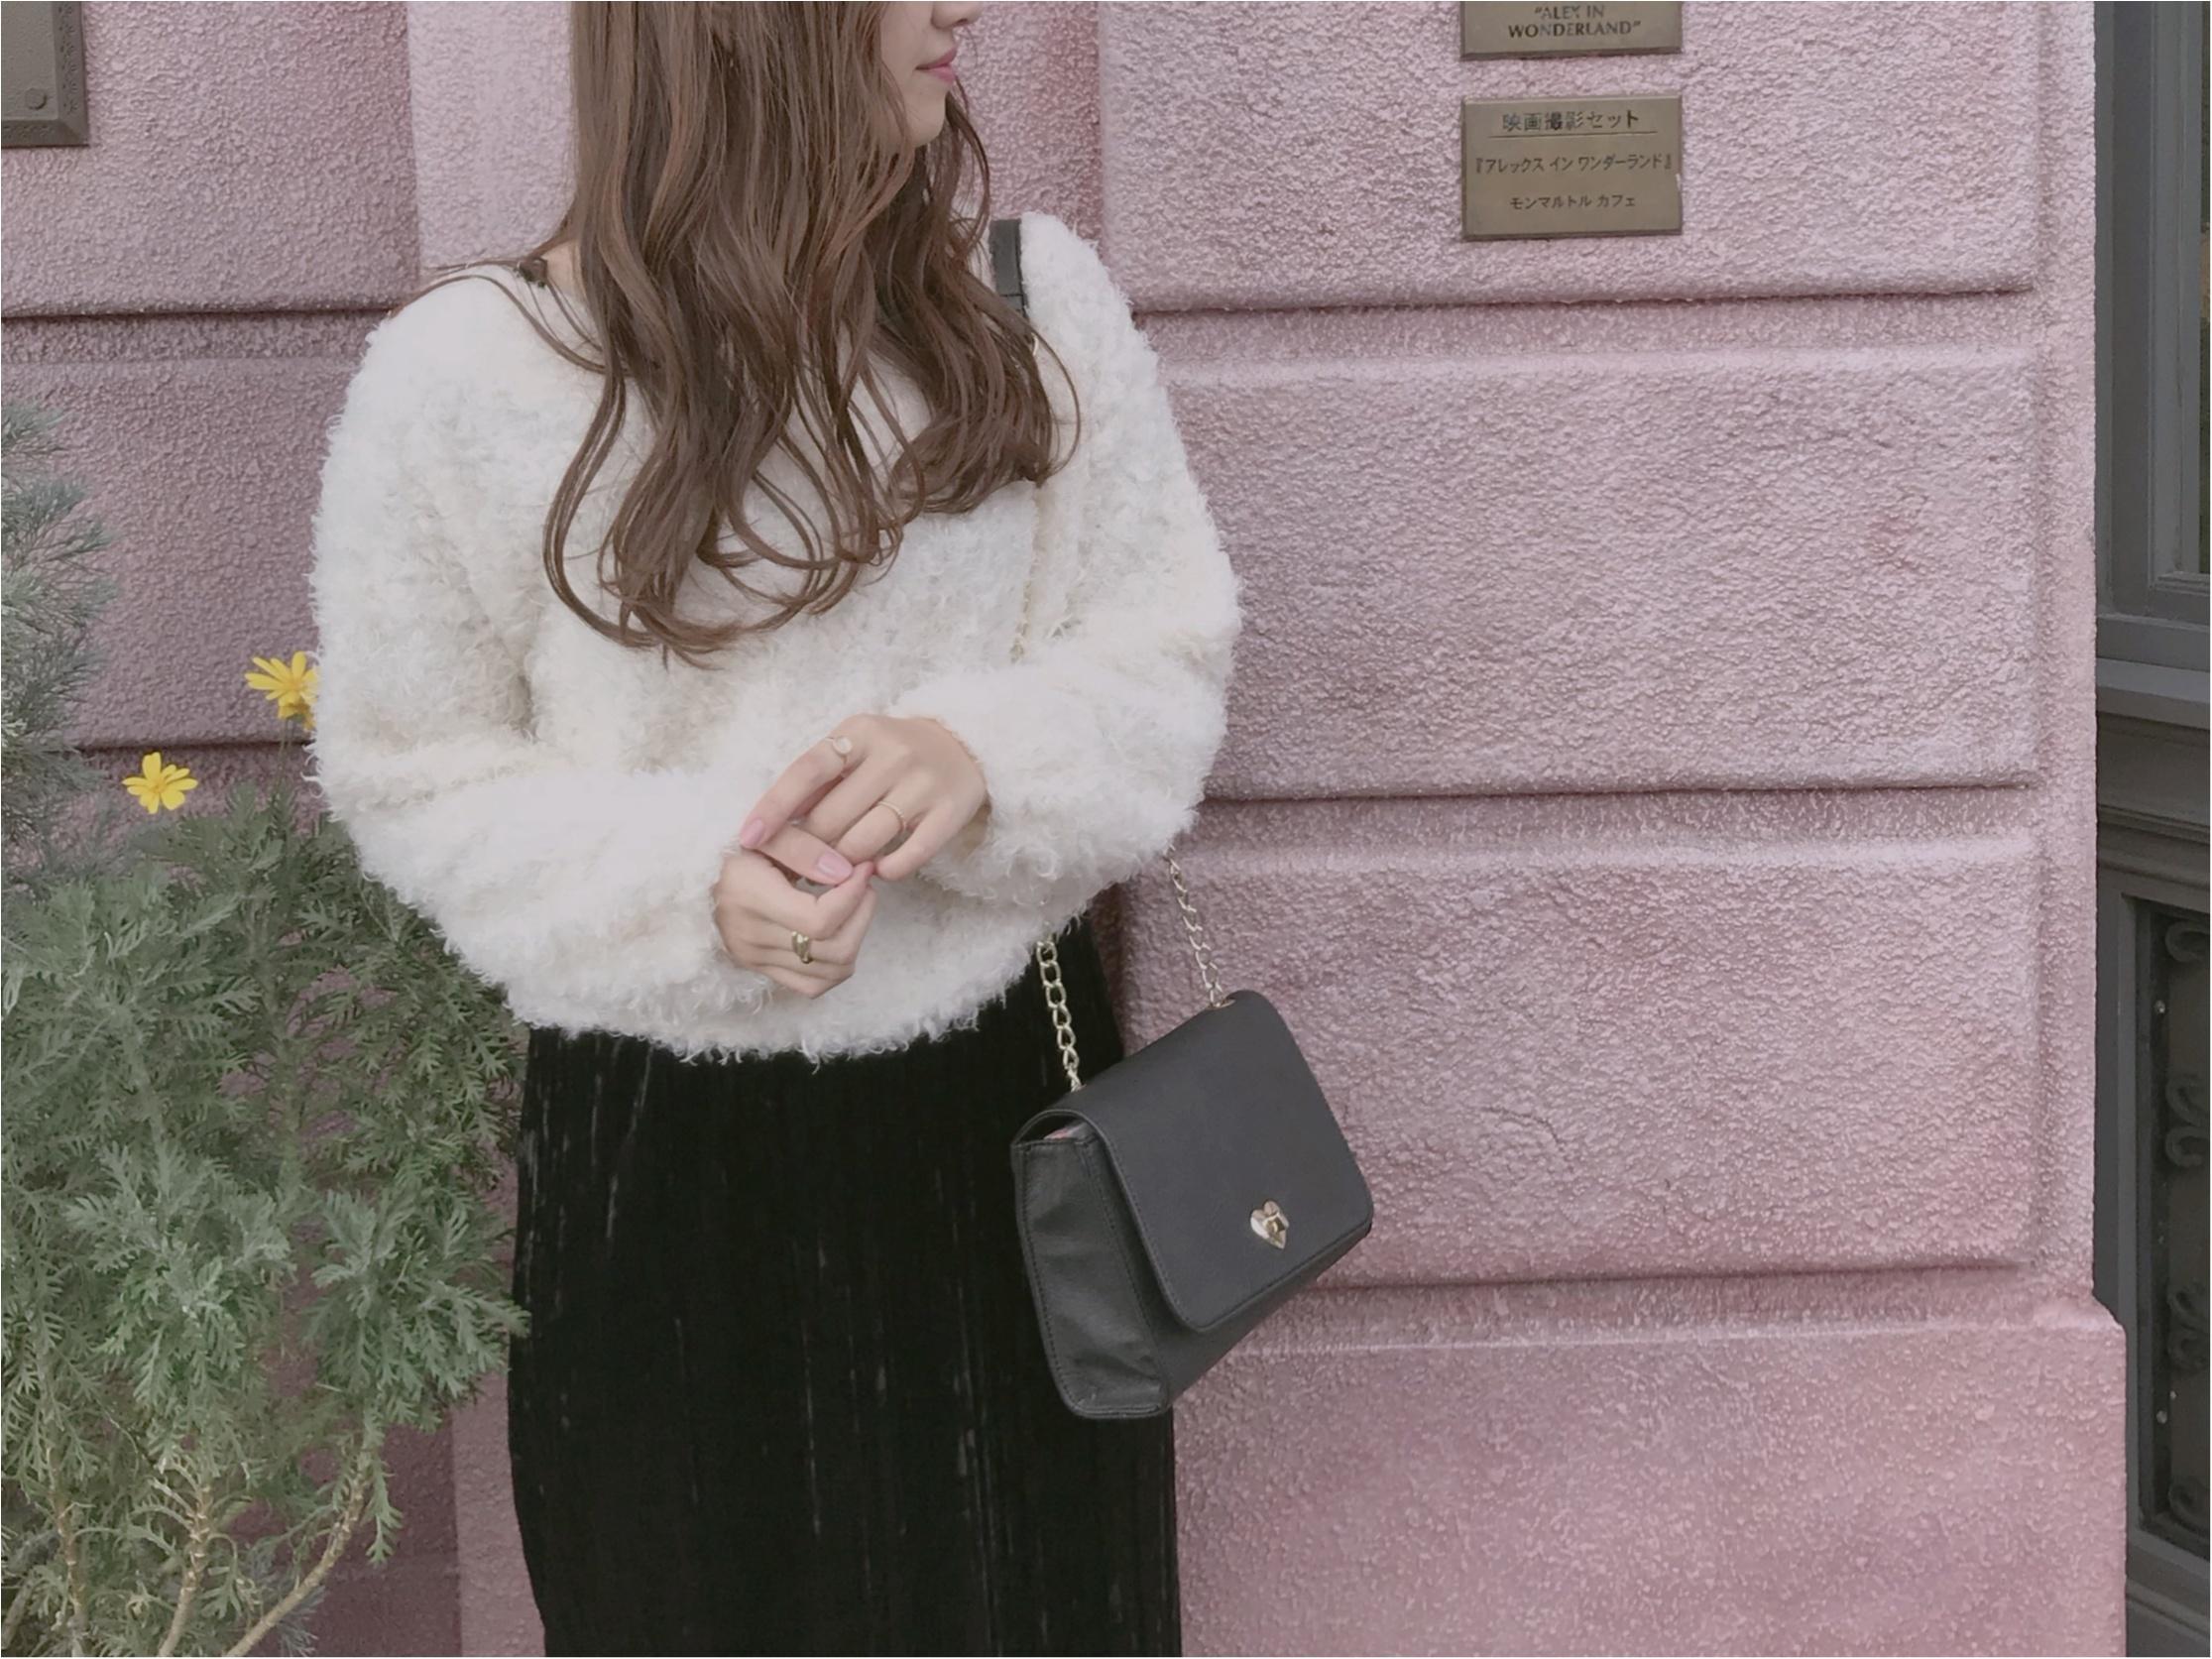 miumiuで新しい財布を購入❤︎コンパクトでかなり使いやすい♡_2